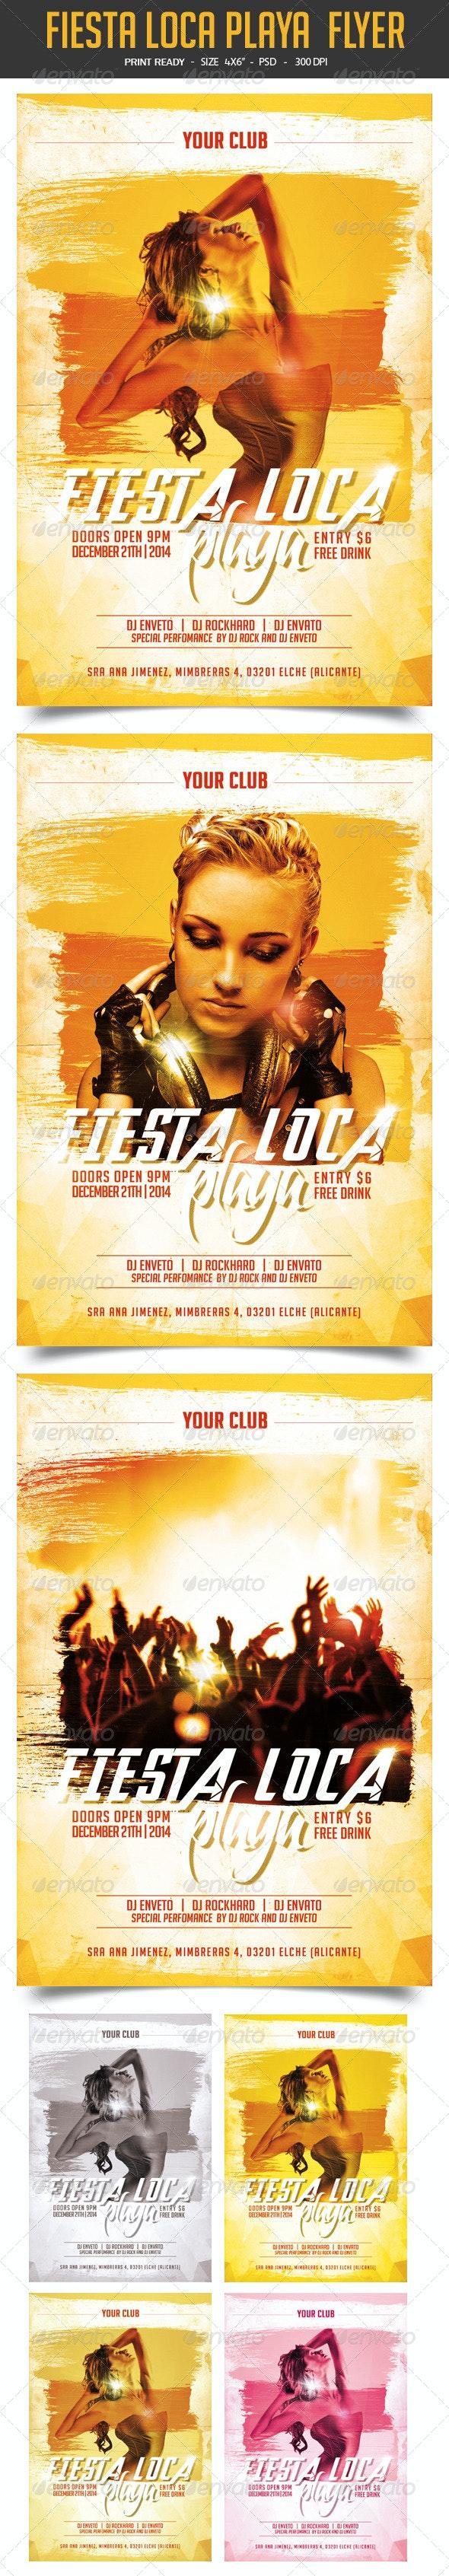 Fiesta Loca Playa Flyer Vol.2 - Clubs & Parties Events